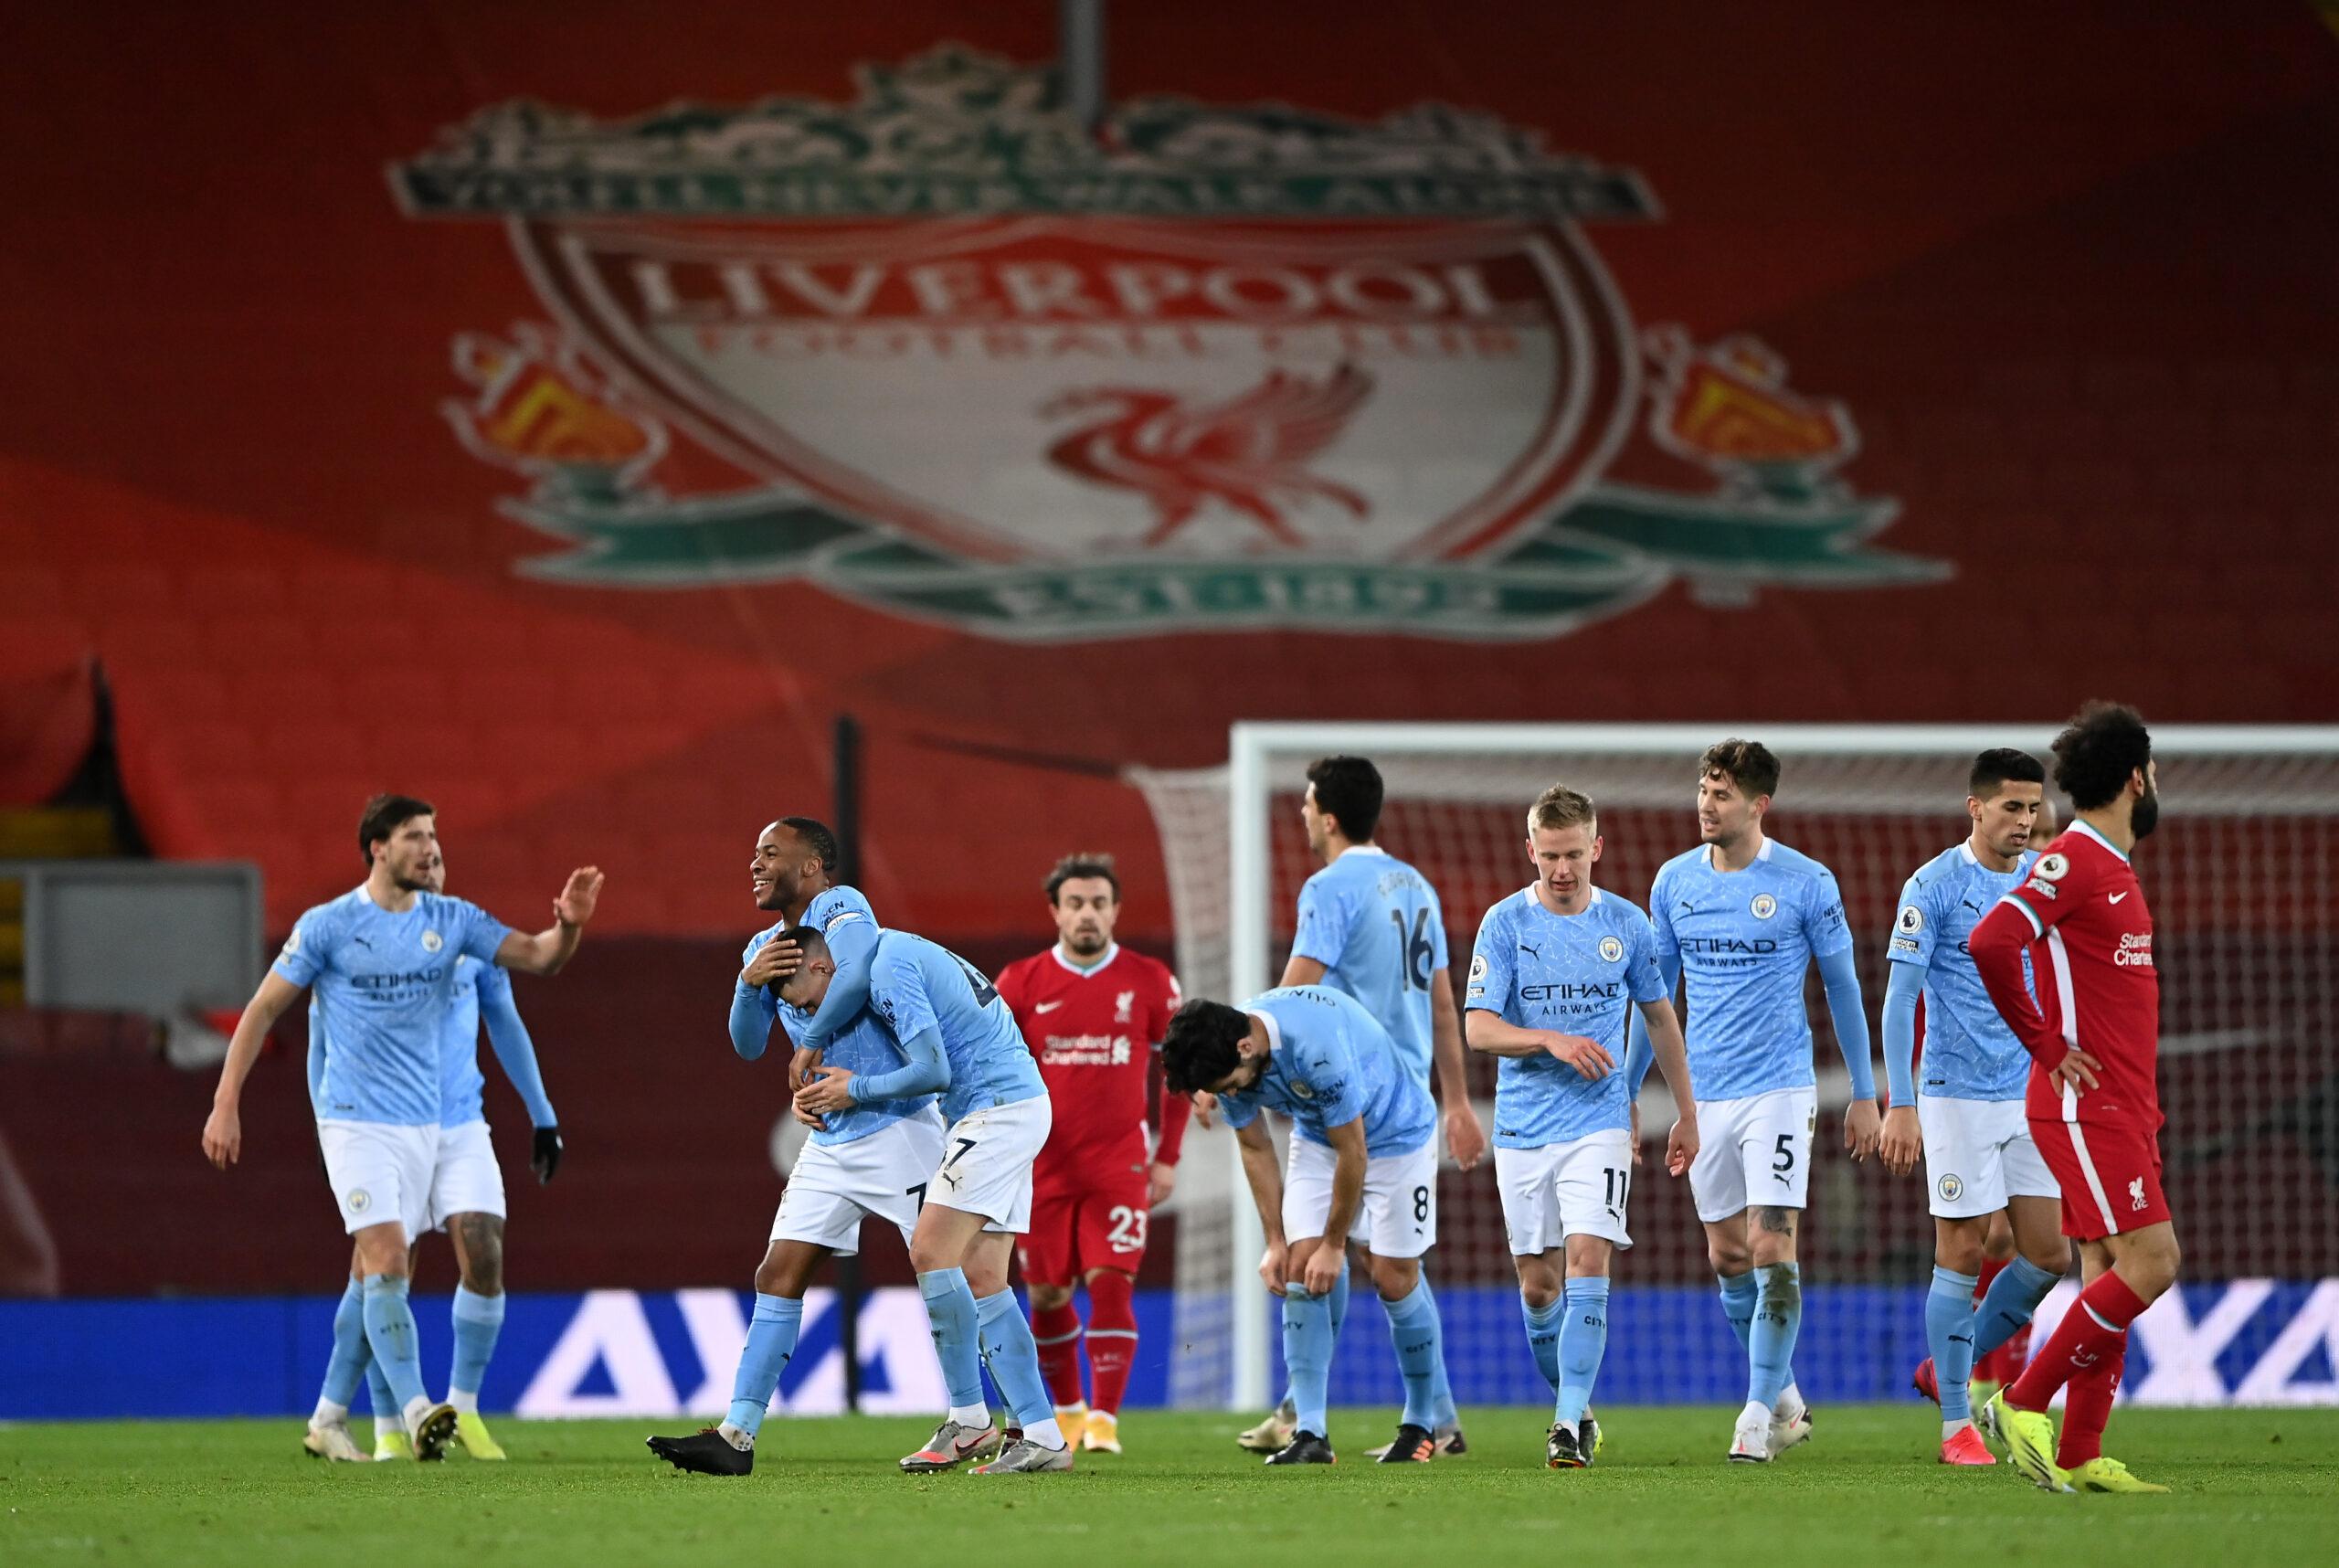 Club Brugge Manchester City formazioni ufficiali